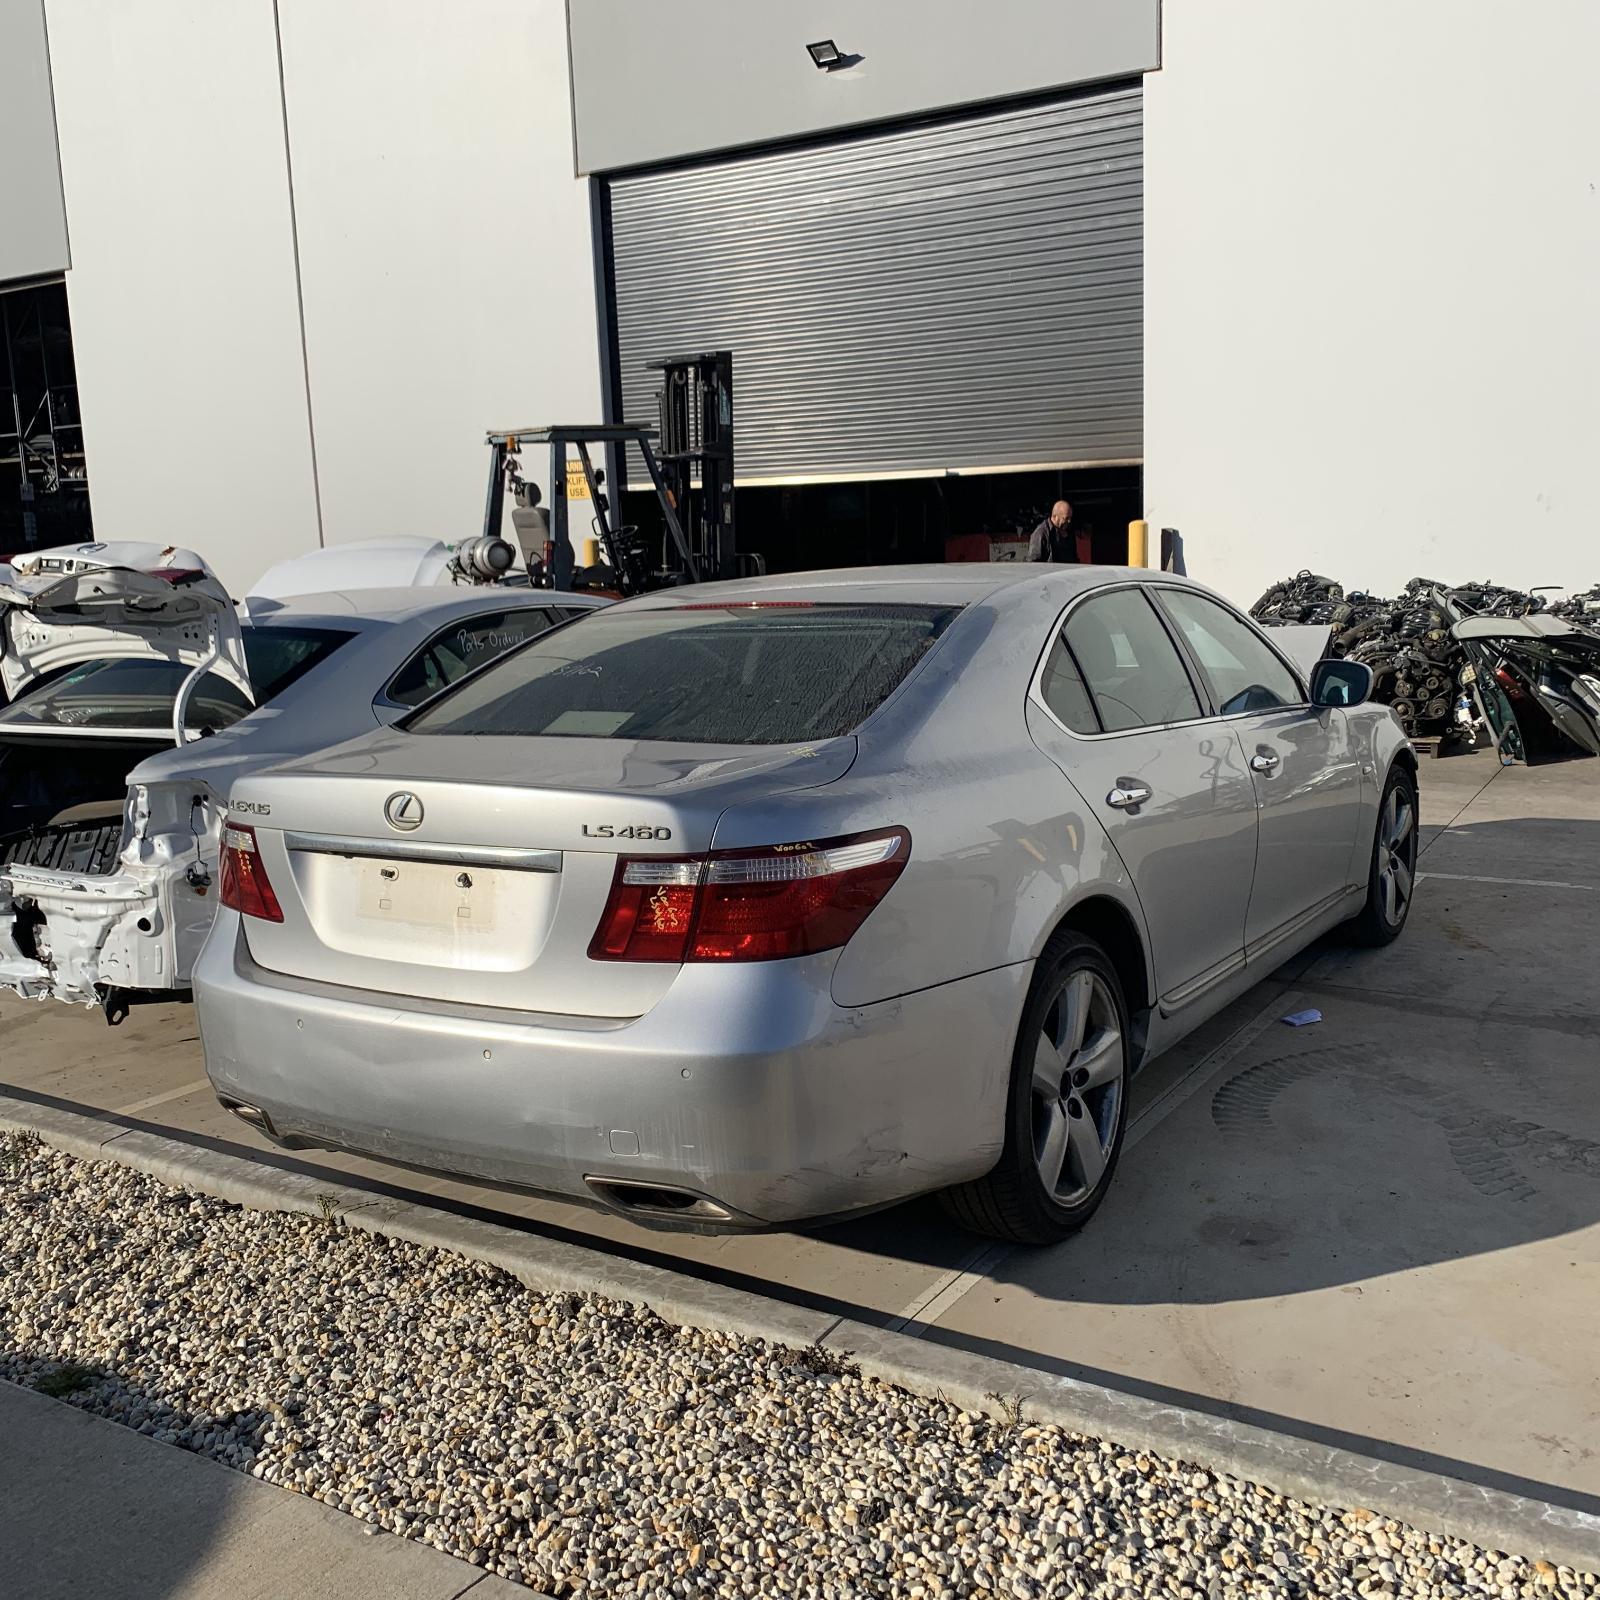 Lexus LS 460 1UR-FSE 4.6L Engine Automatic RWD Transmission 04/07 - 12/17